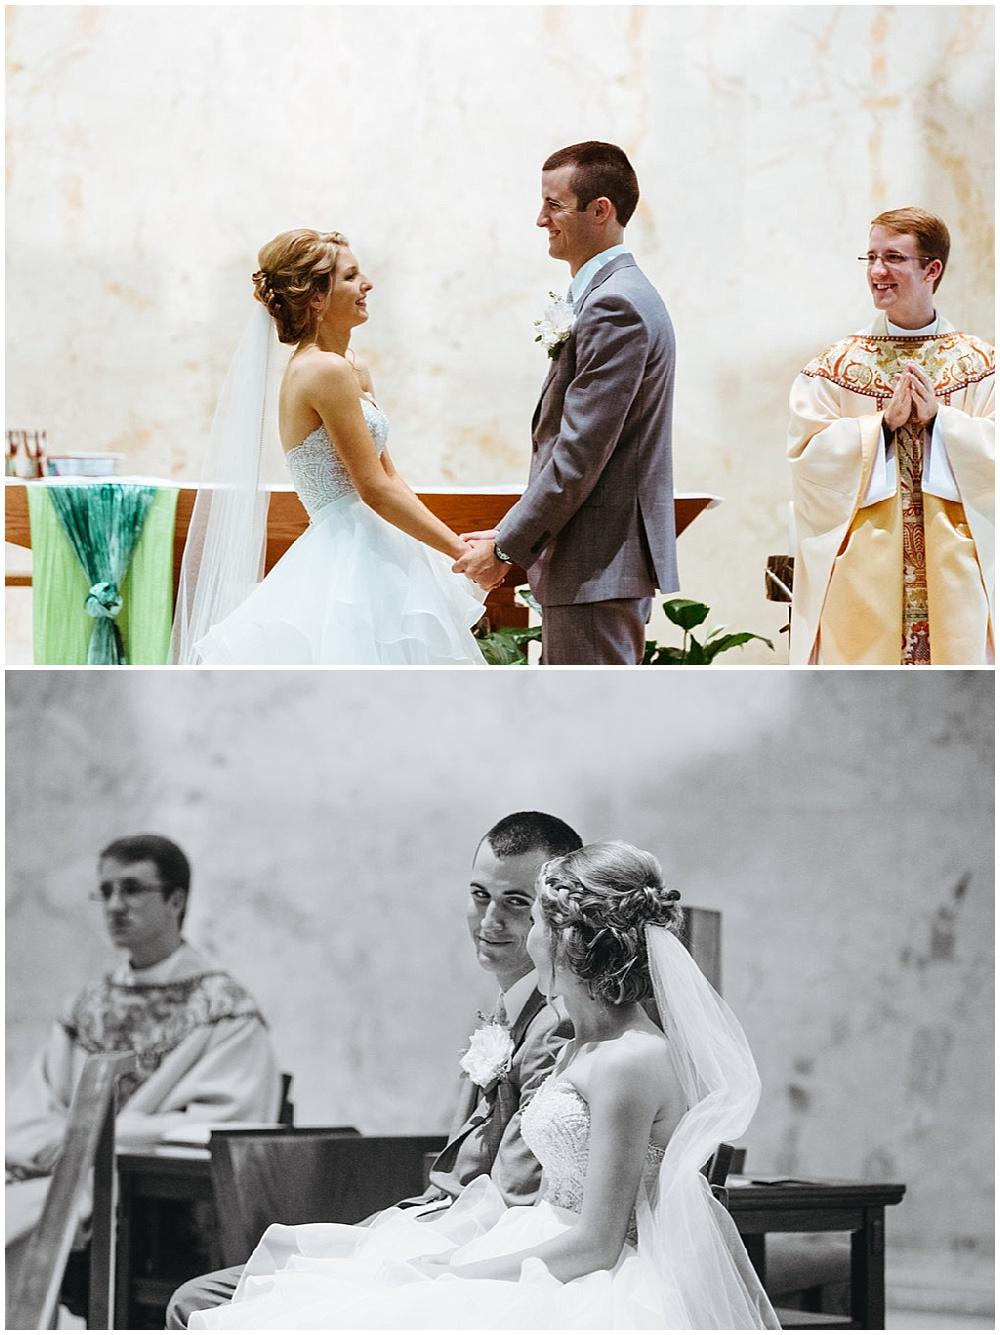 ceremony | Chicago urban rustic wedding| Sandra Armenteros Photography | Jessica Dum Wedding Coordination